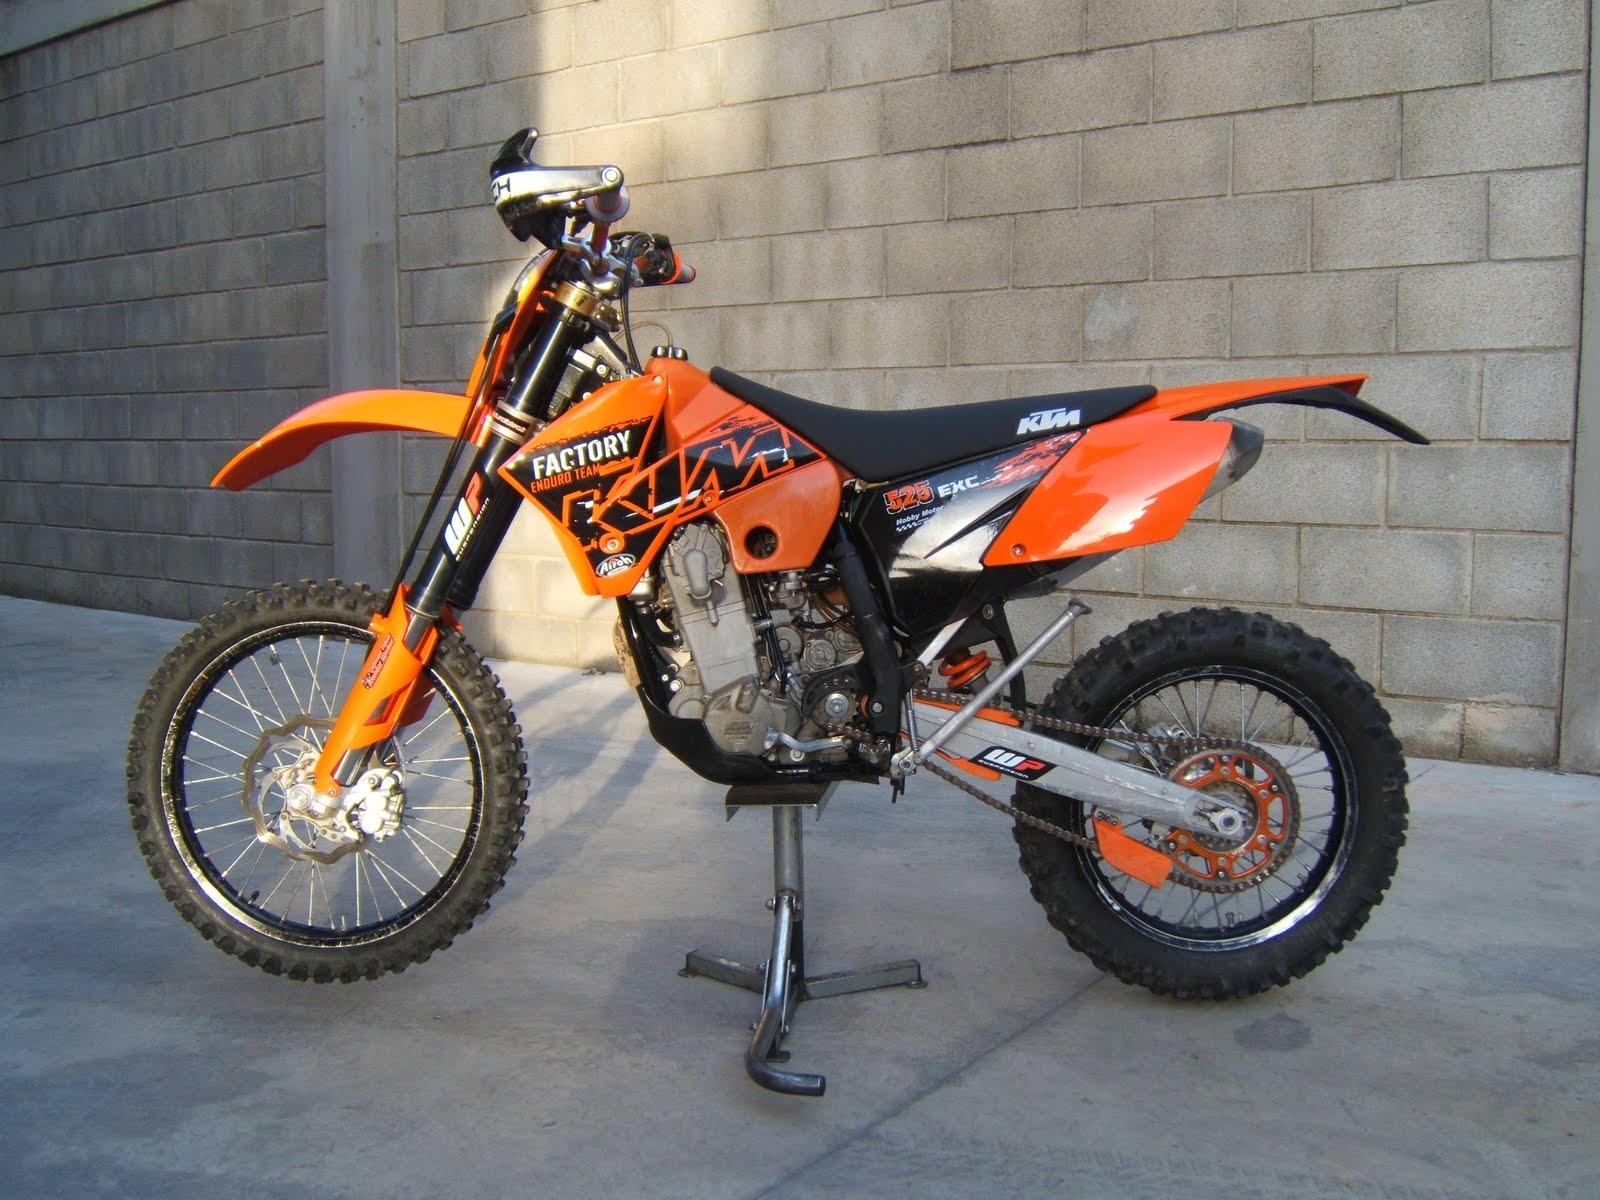 Hobby motor ragusa ktm exc factory for Moto usate in regalo